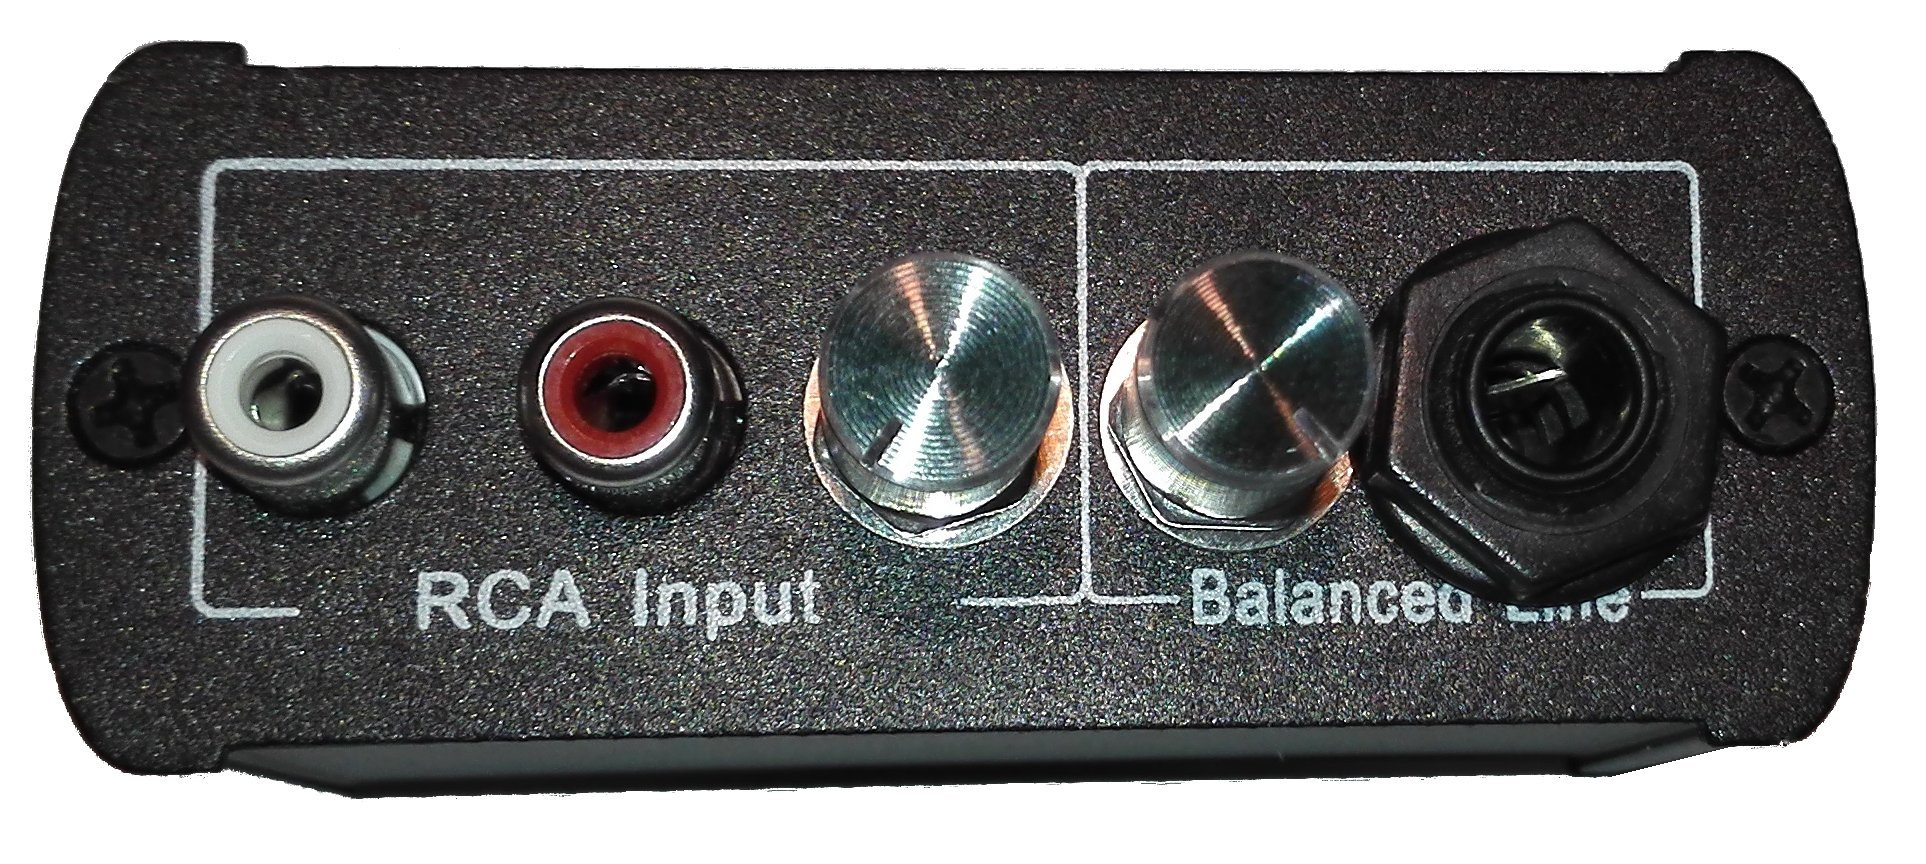 Di Box, Balanced 3 Channel Mixer : Microphone/instrument (Balanced Line), Stereo Music (2x Rca Input), Mono Output